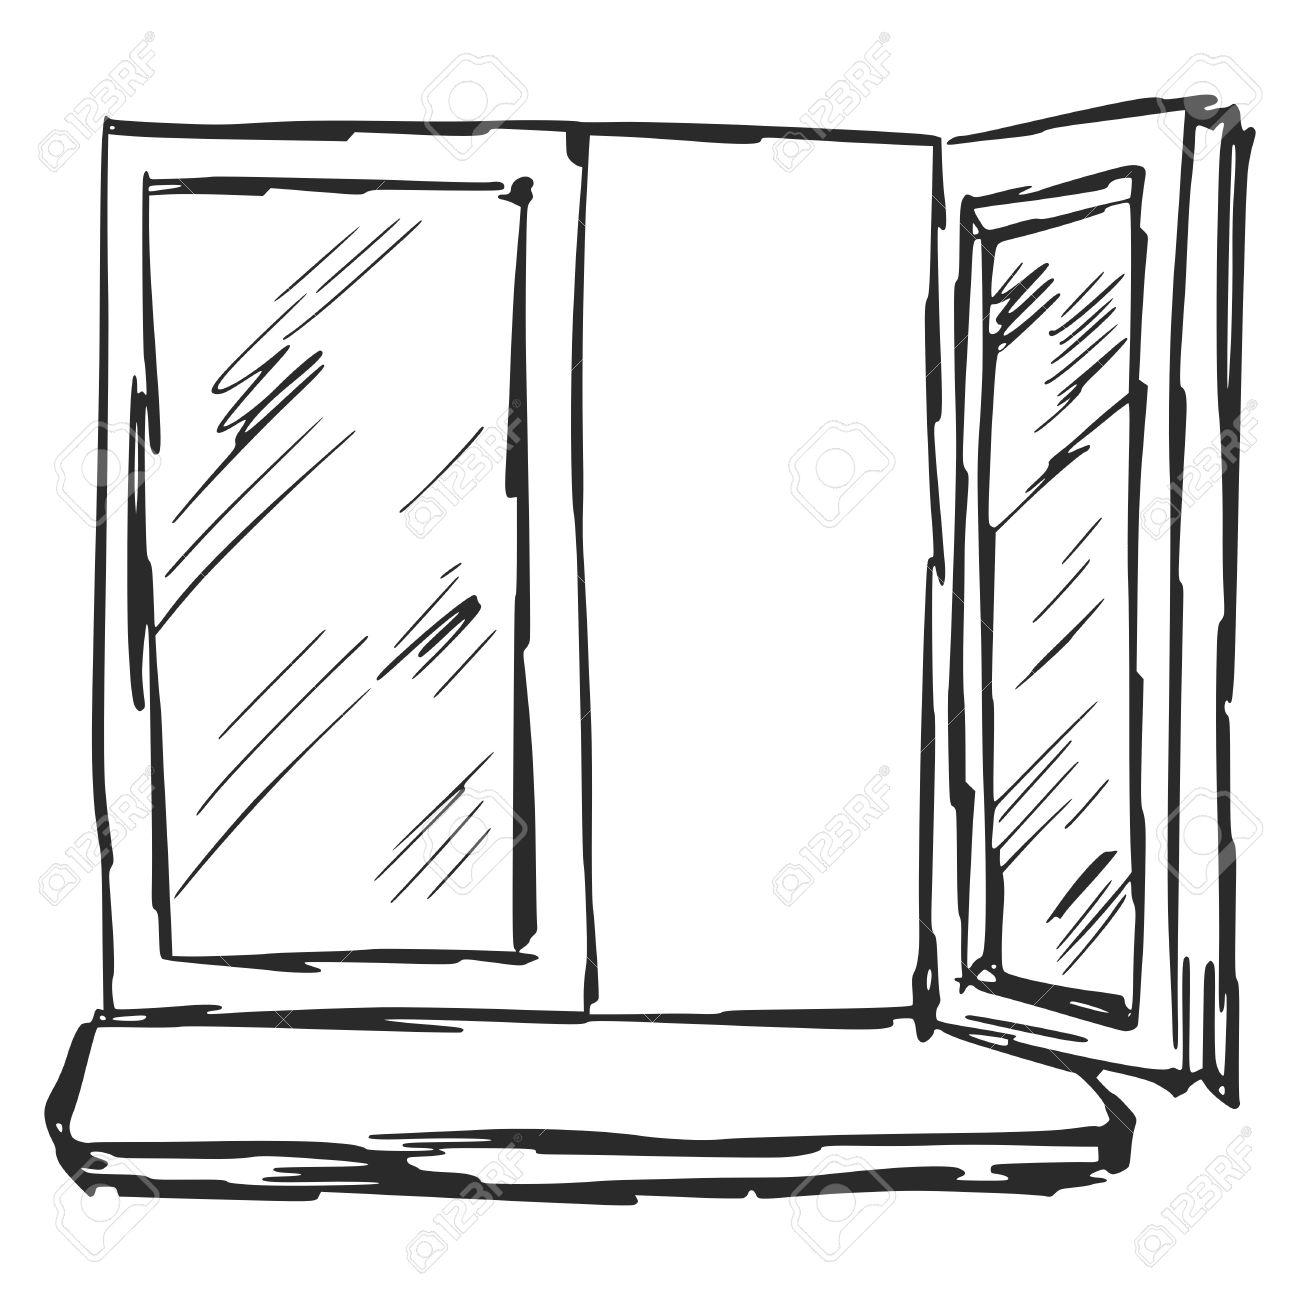 Hand drawn sketch cartoon illustration of window royalty free hand drawn sketch cartoon illustration of window stock vector 28433111 thecheapjerseys Gallery